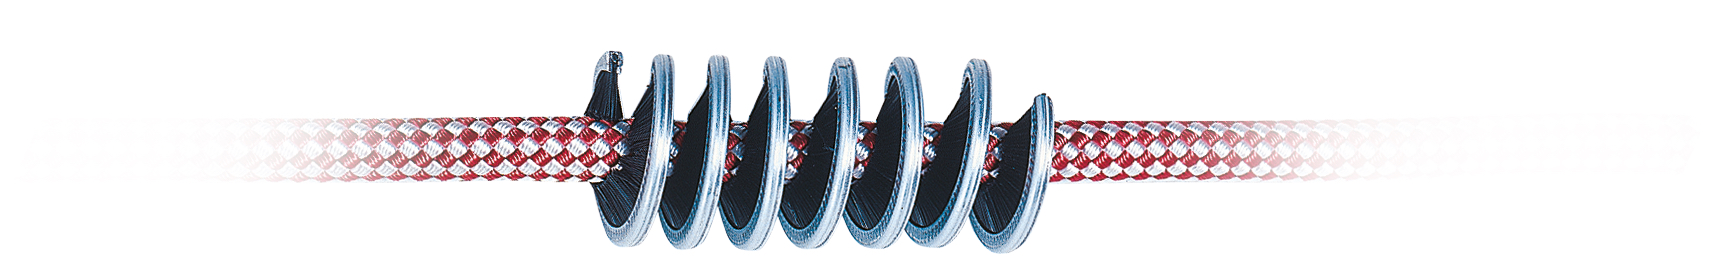 Beal Rope Brush - Brosse pour corde